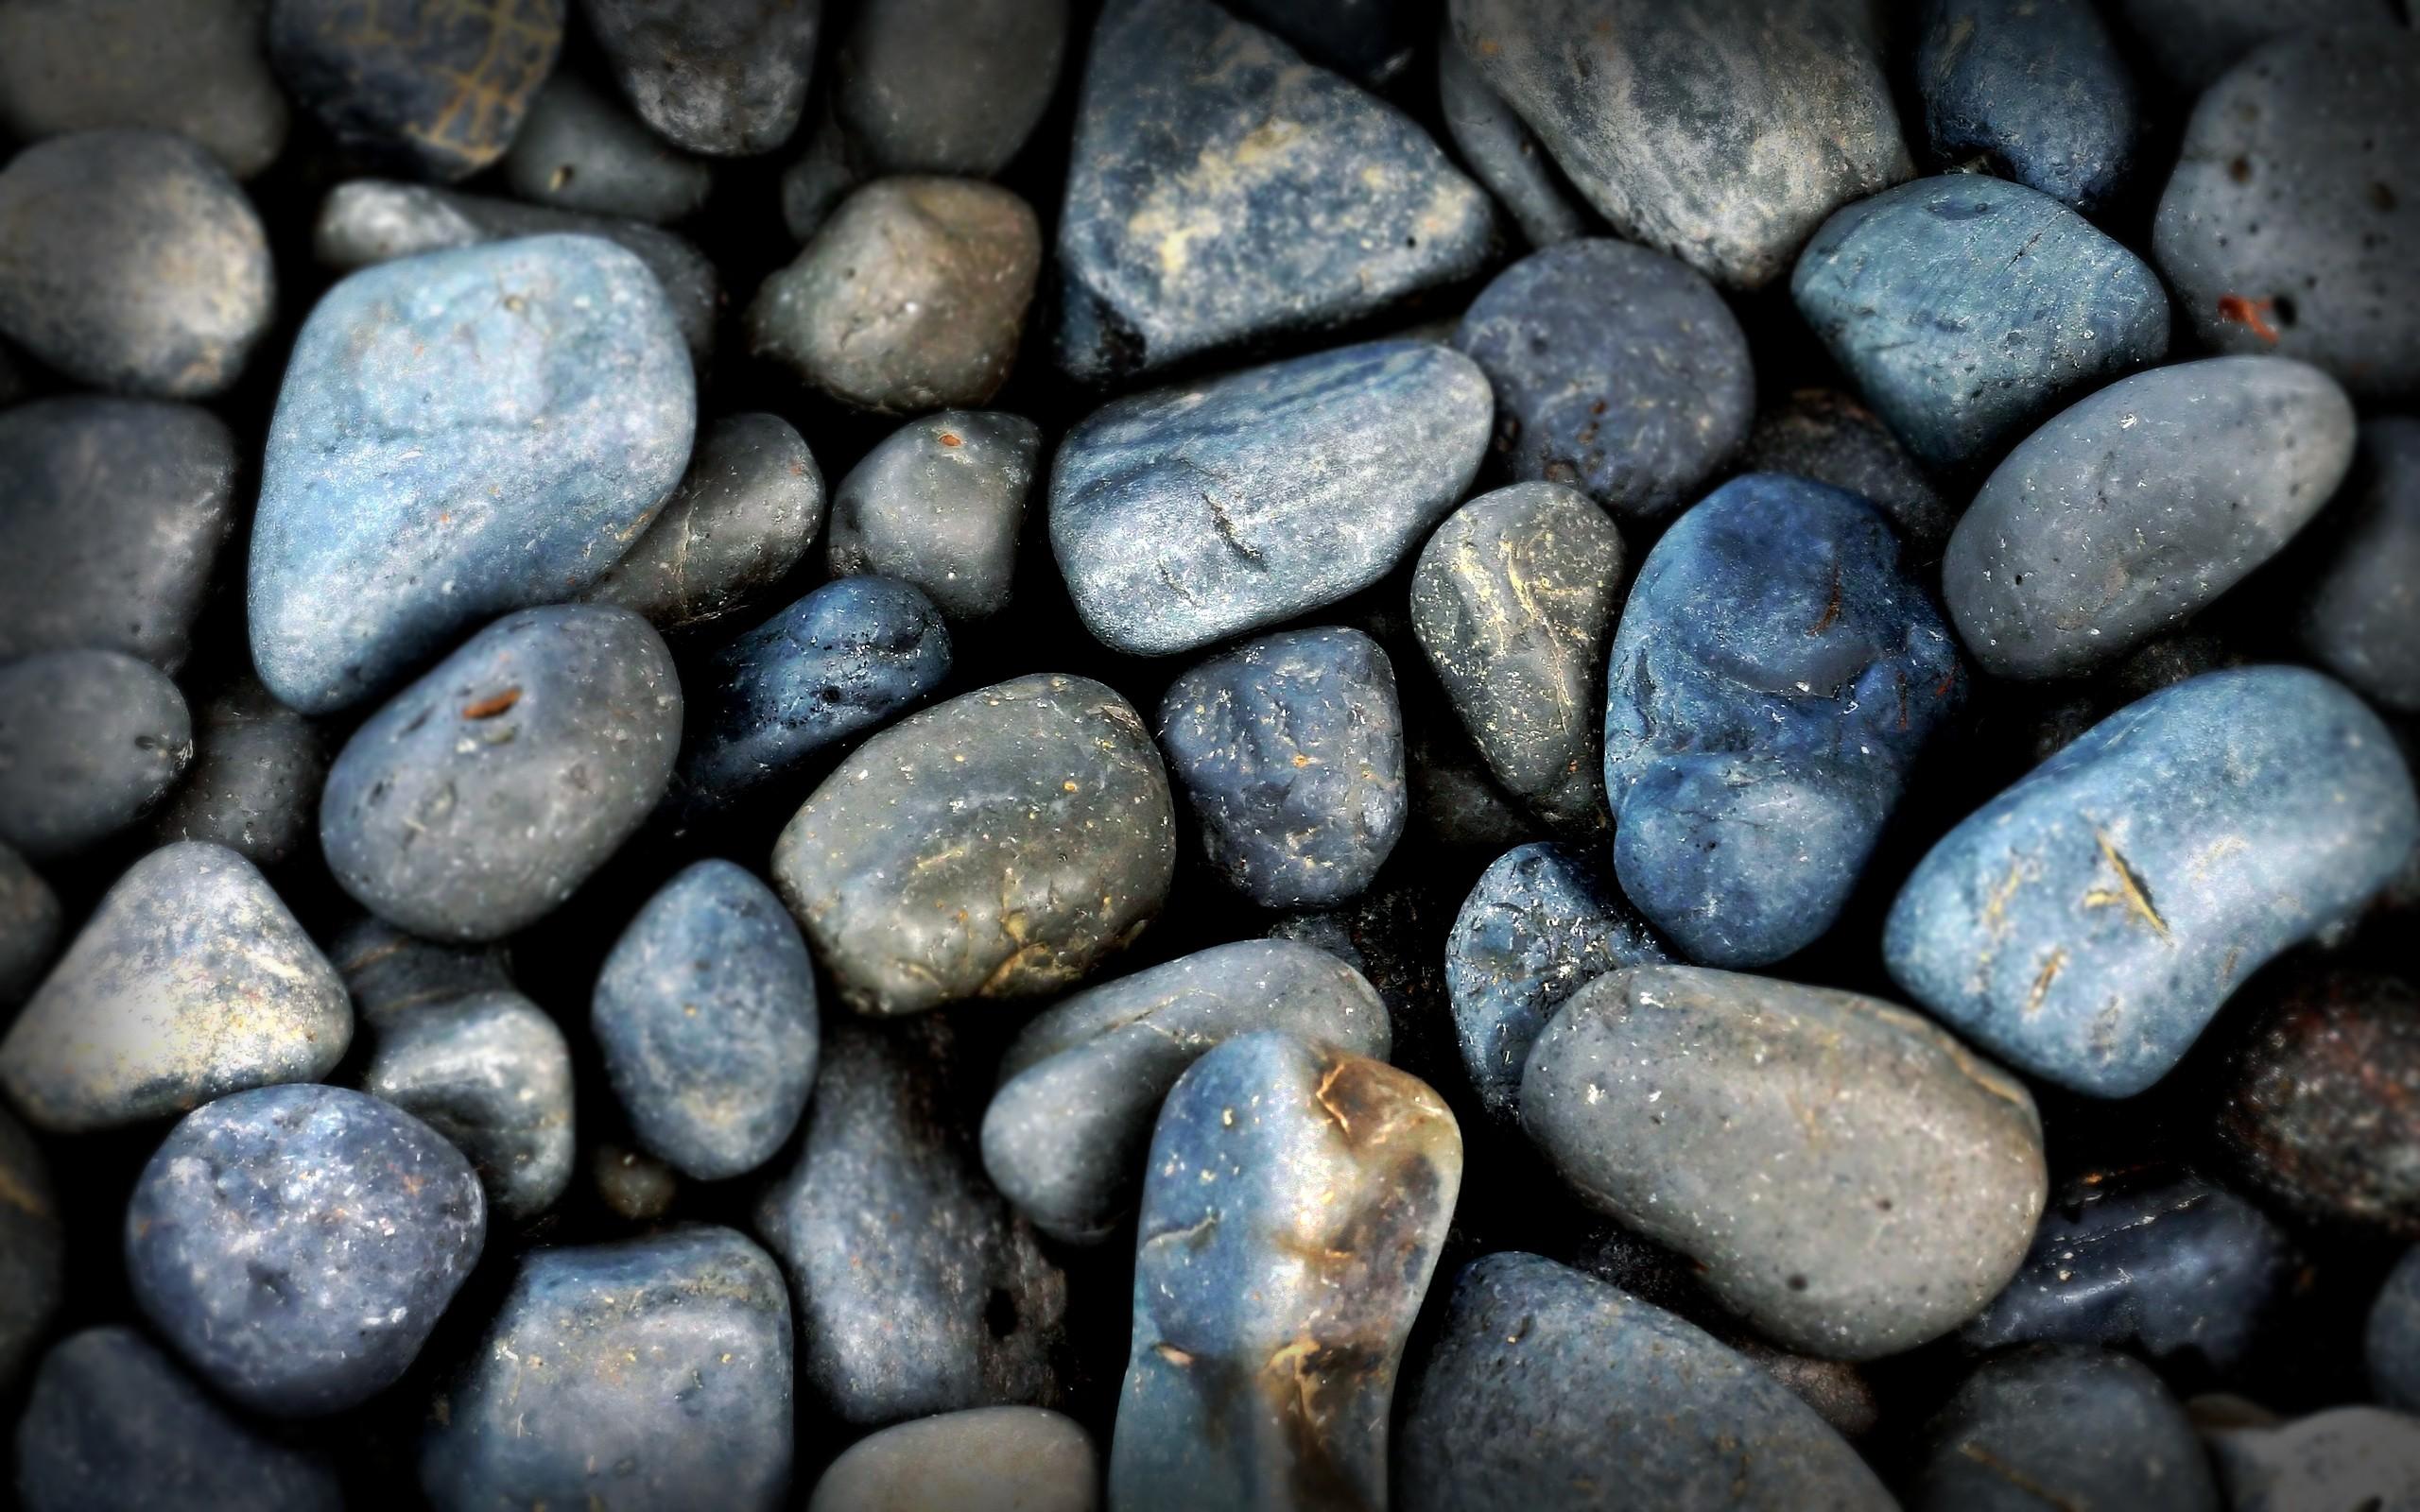 2560x1600 Gray Stones desktop PC and Mac wallpaper 2560x1600